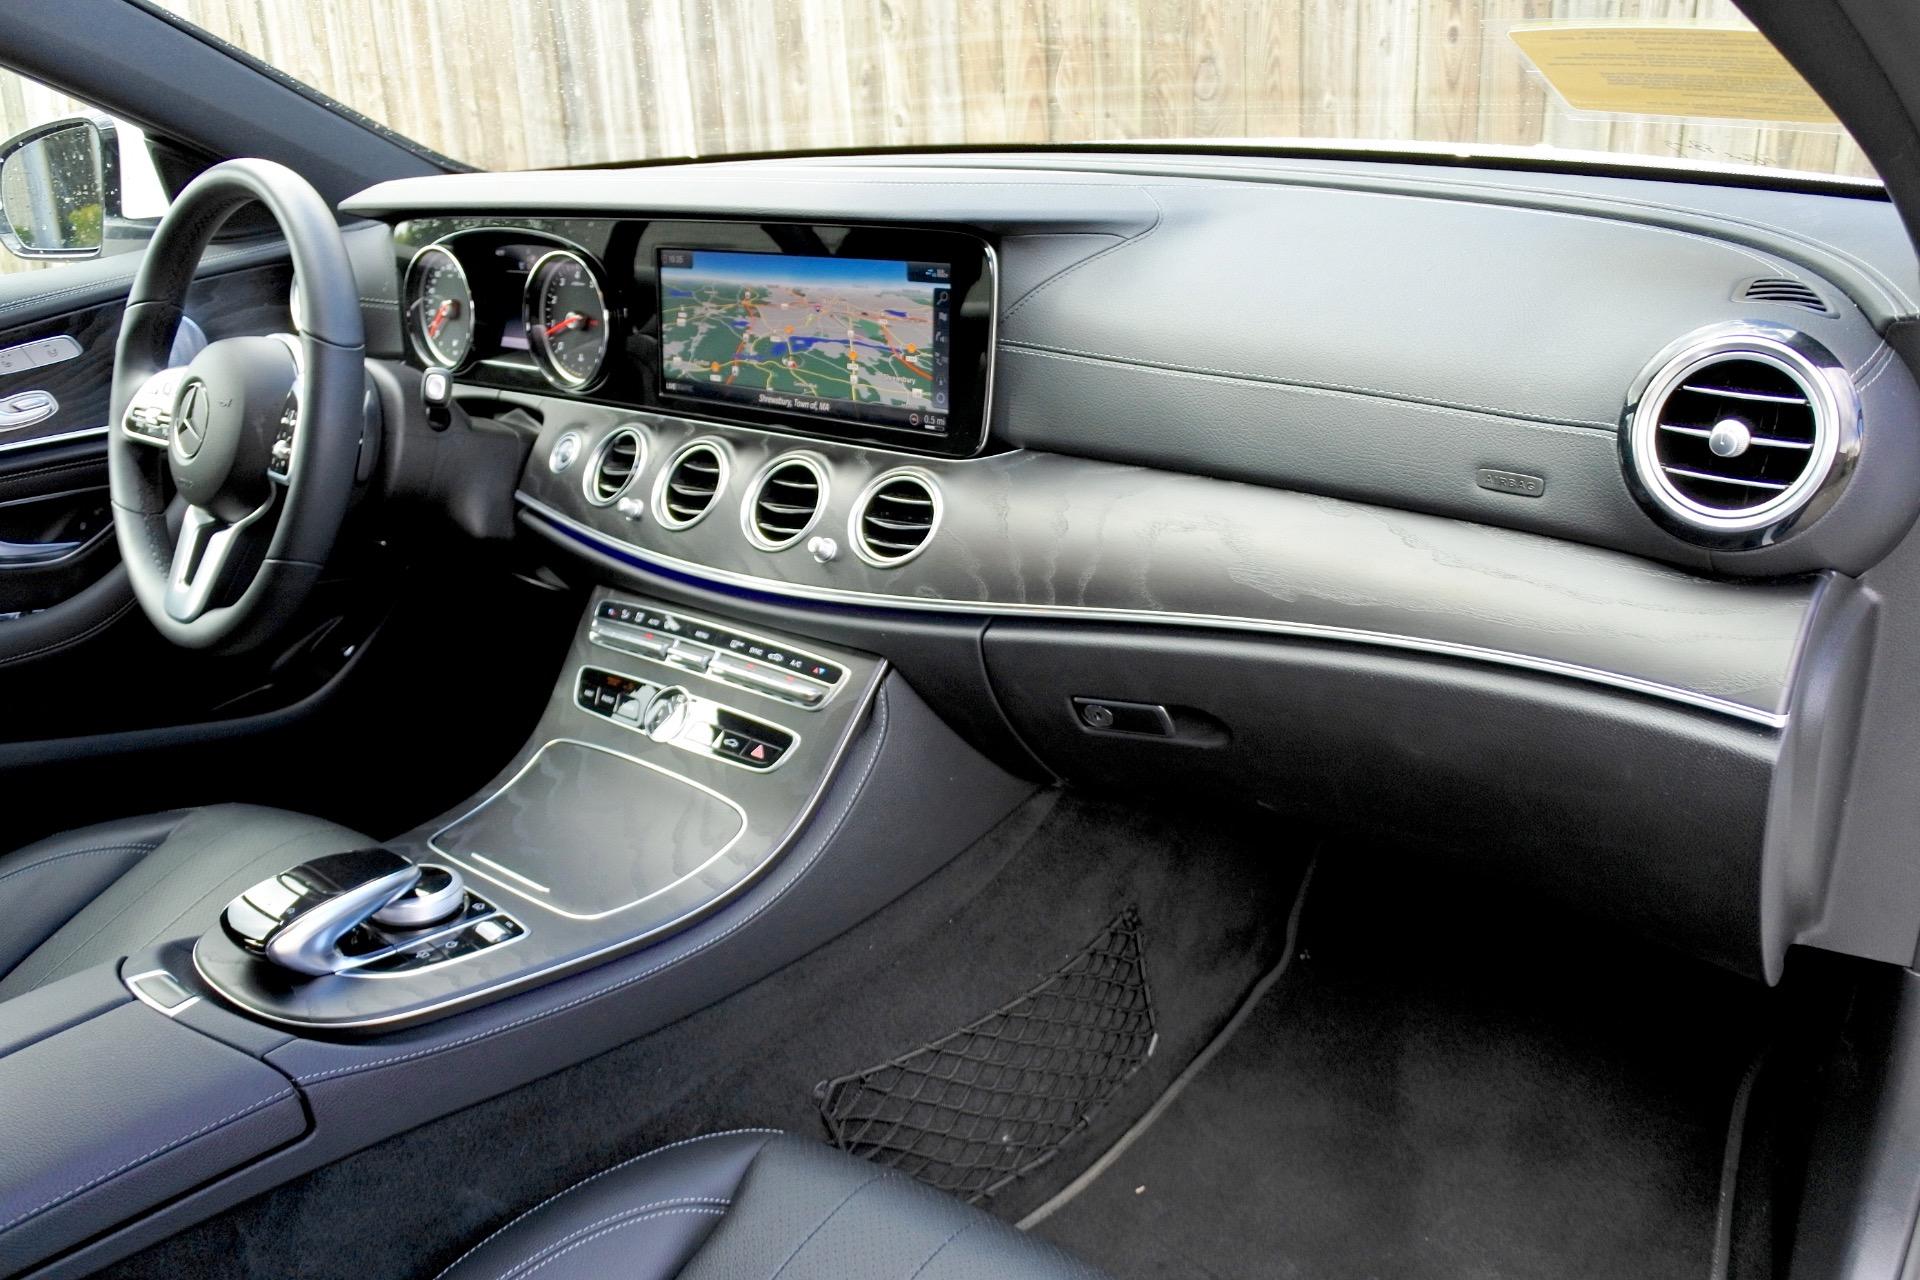 Used 2019 Mercedes-Benz E-class E 300 4MATIC Used 2019 Mercedes-Benz E-class E 300 4MATIC for sale  at Metro West Motorcars LLC in Shrewsbury MA 20